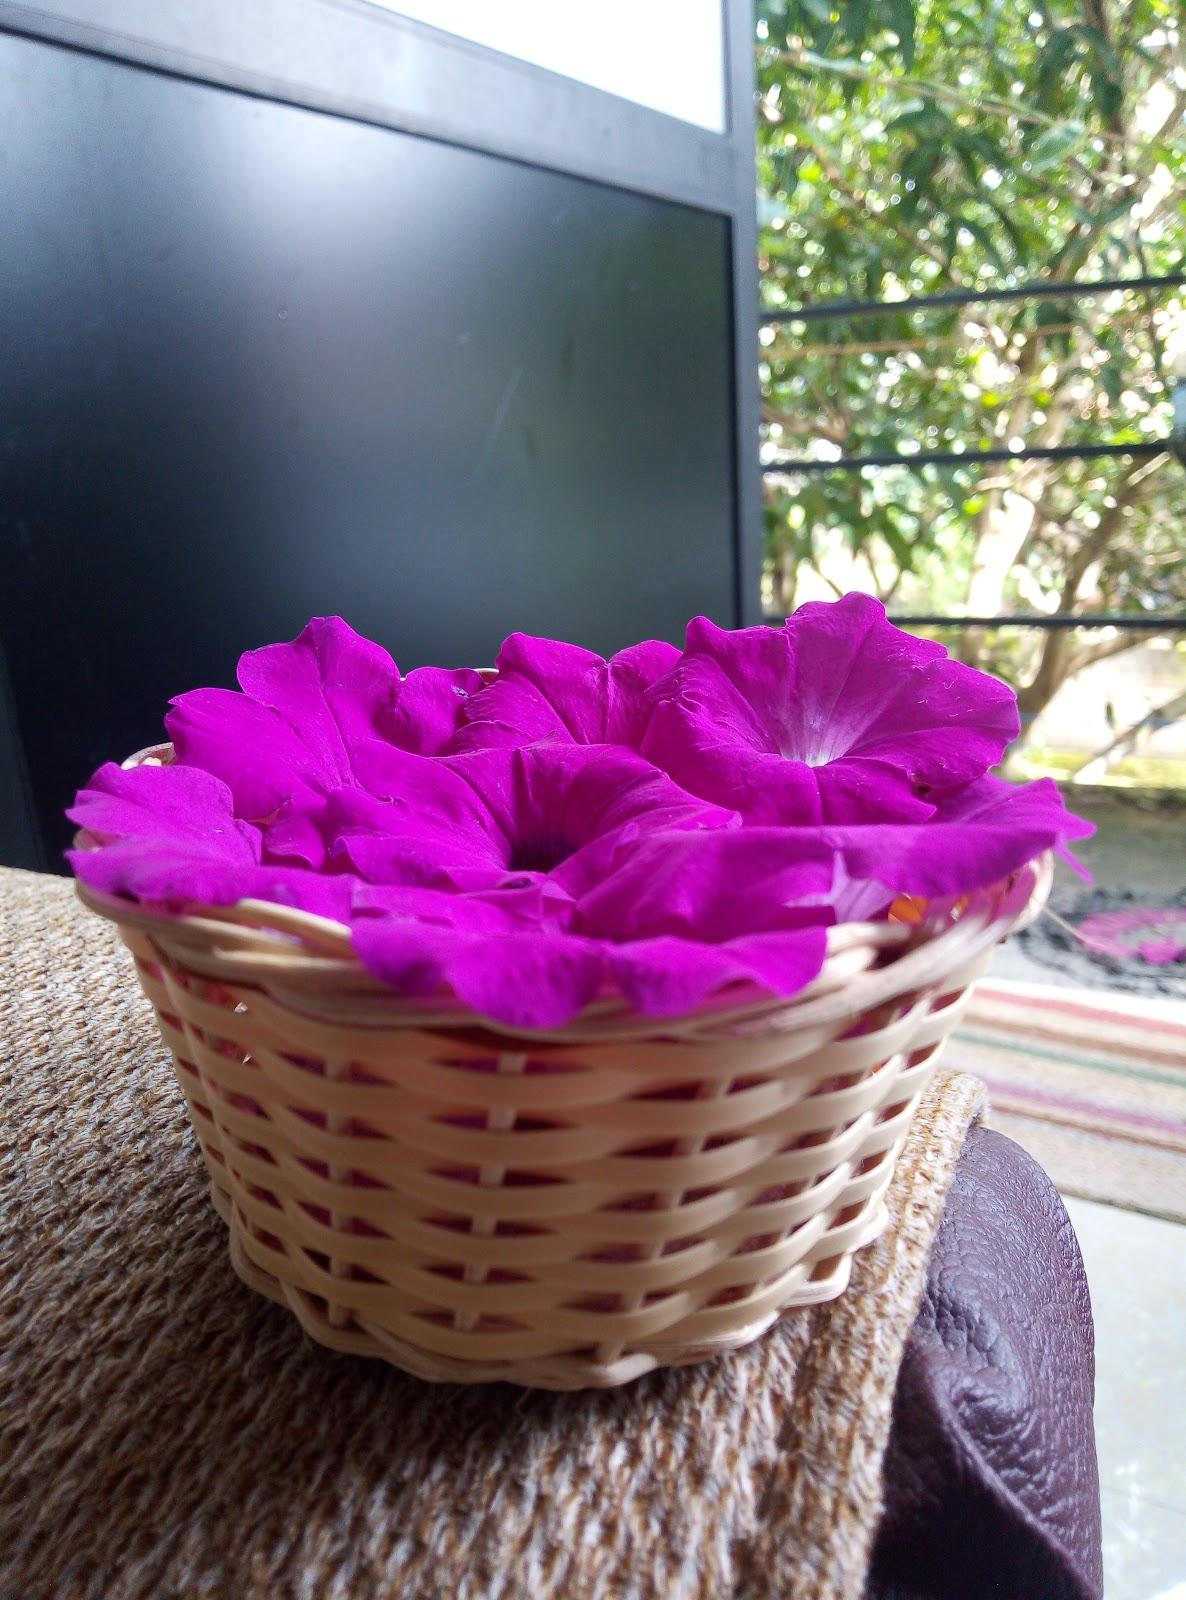 Handmade Small Brown Woven Wicker Cane Bamboo Basket Flowers Fruits Sri Lanka